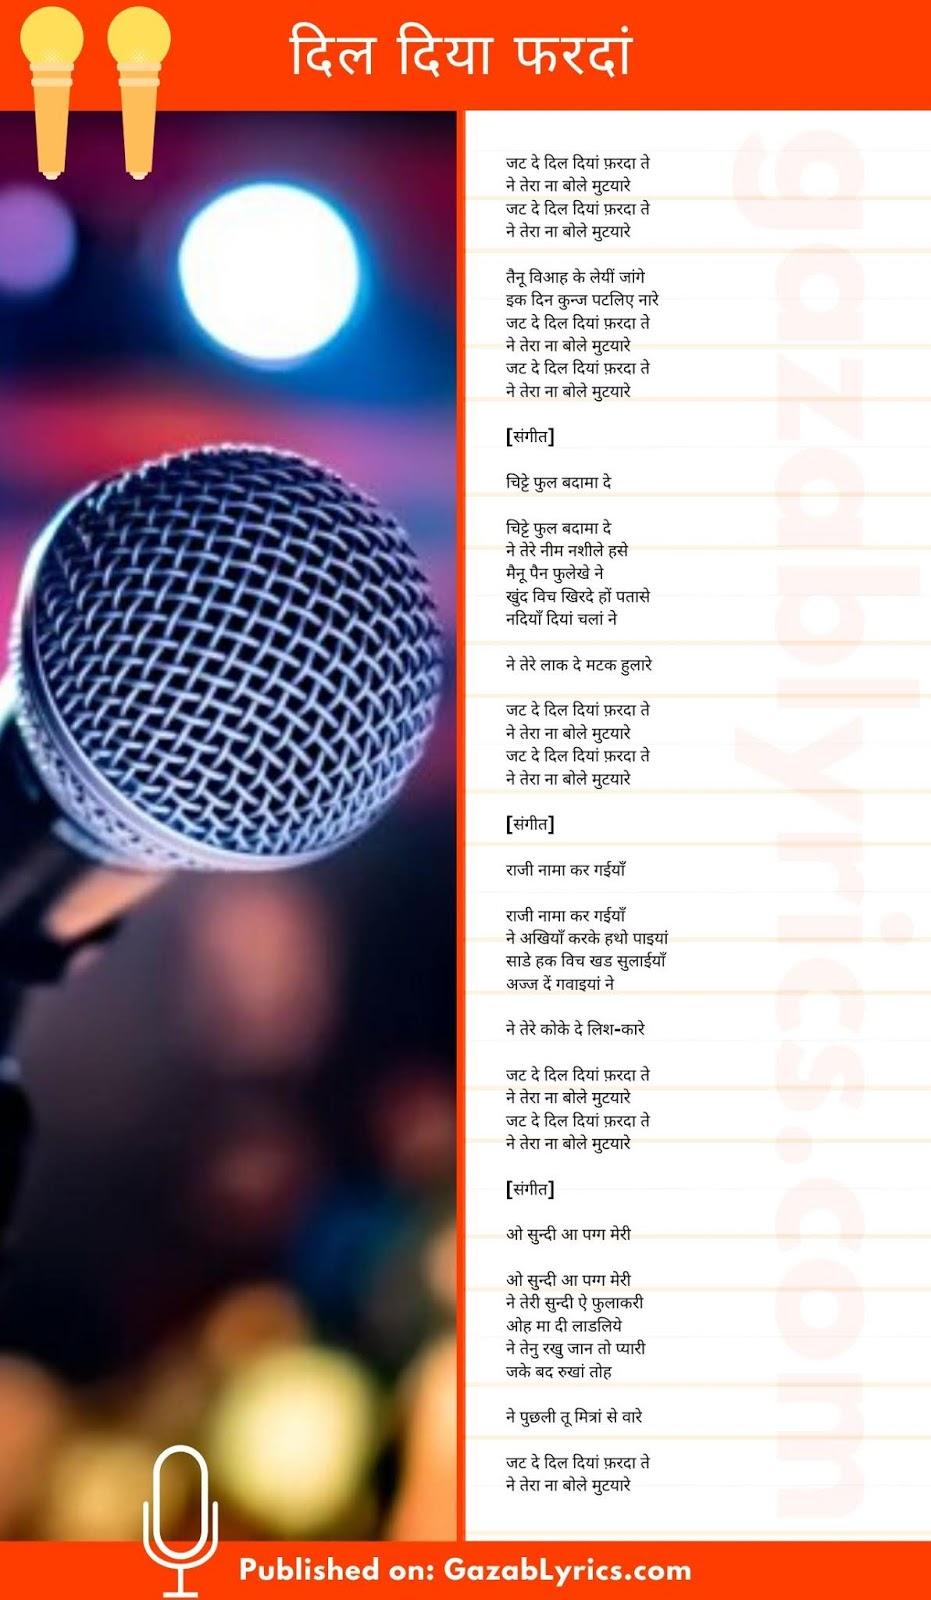 Dil Diya Fardan song lyrics image